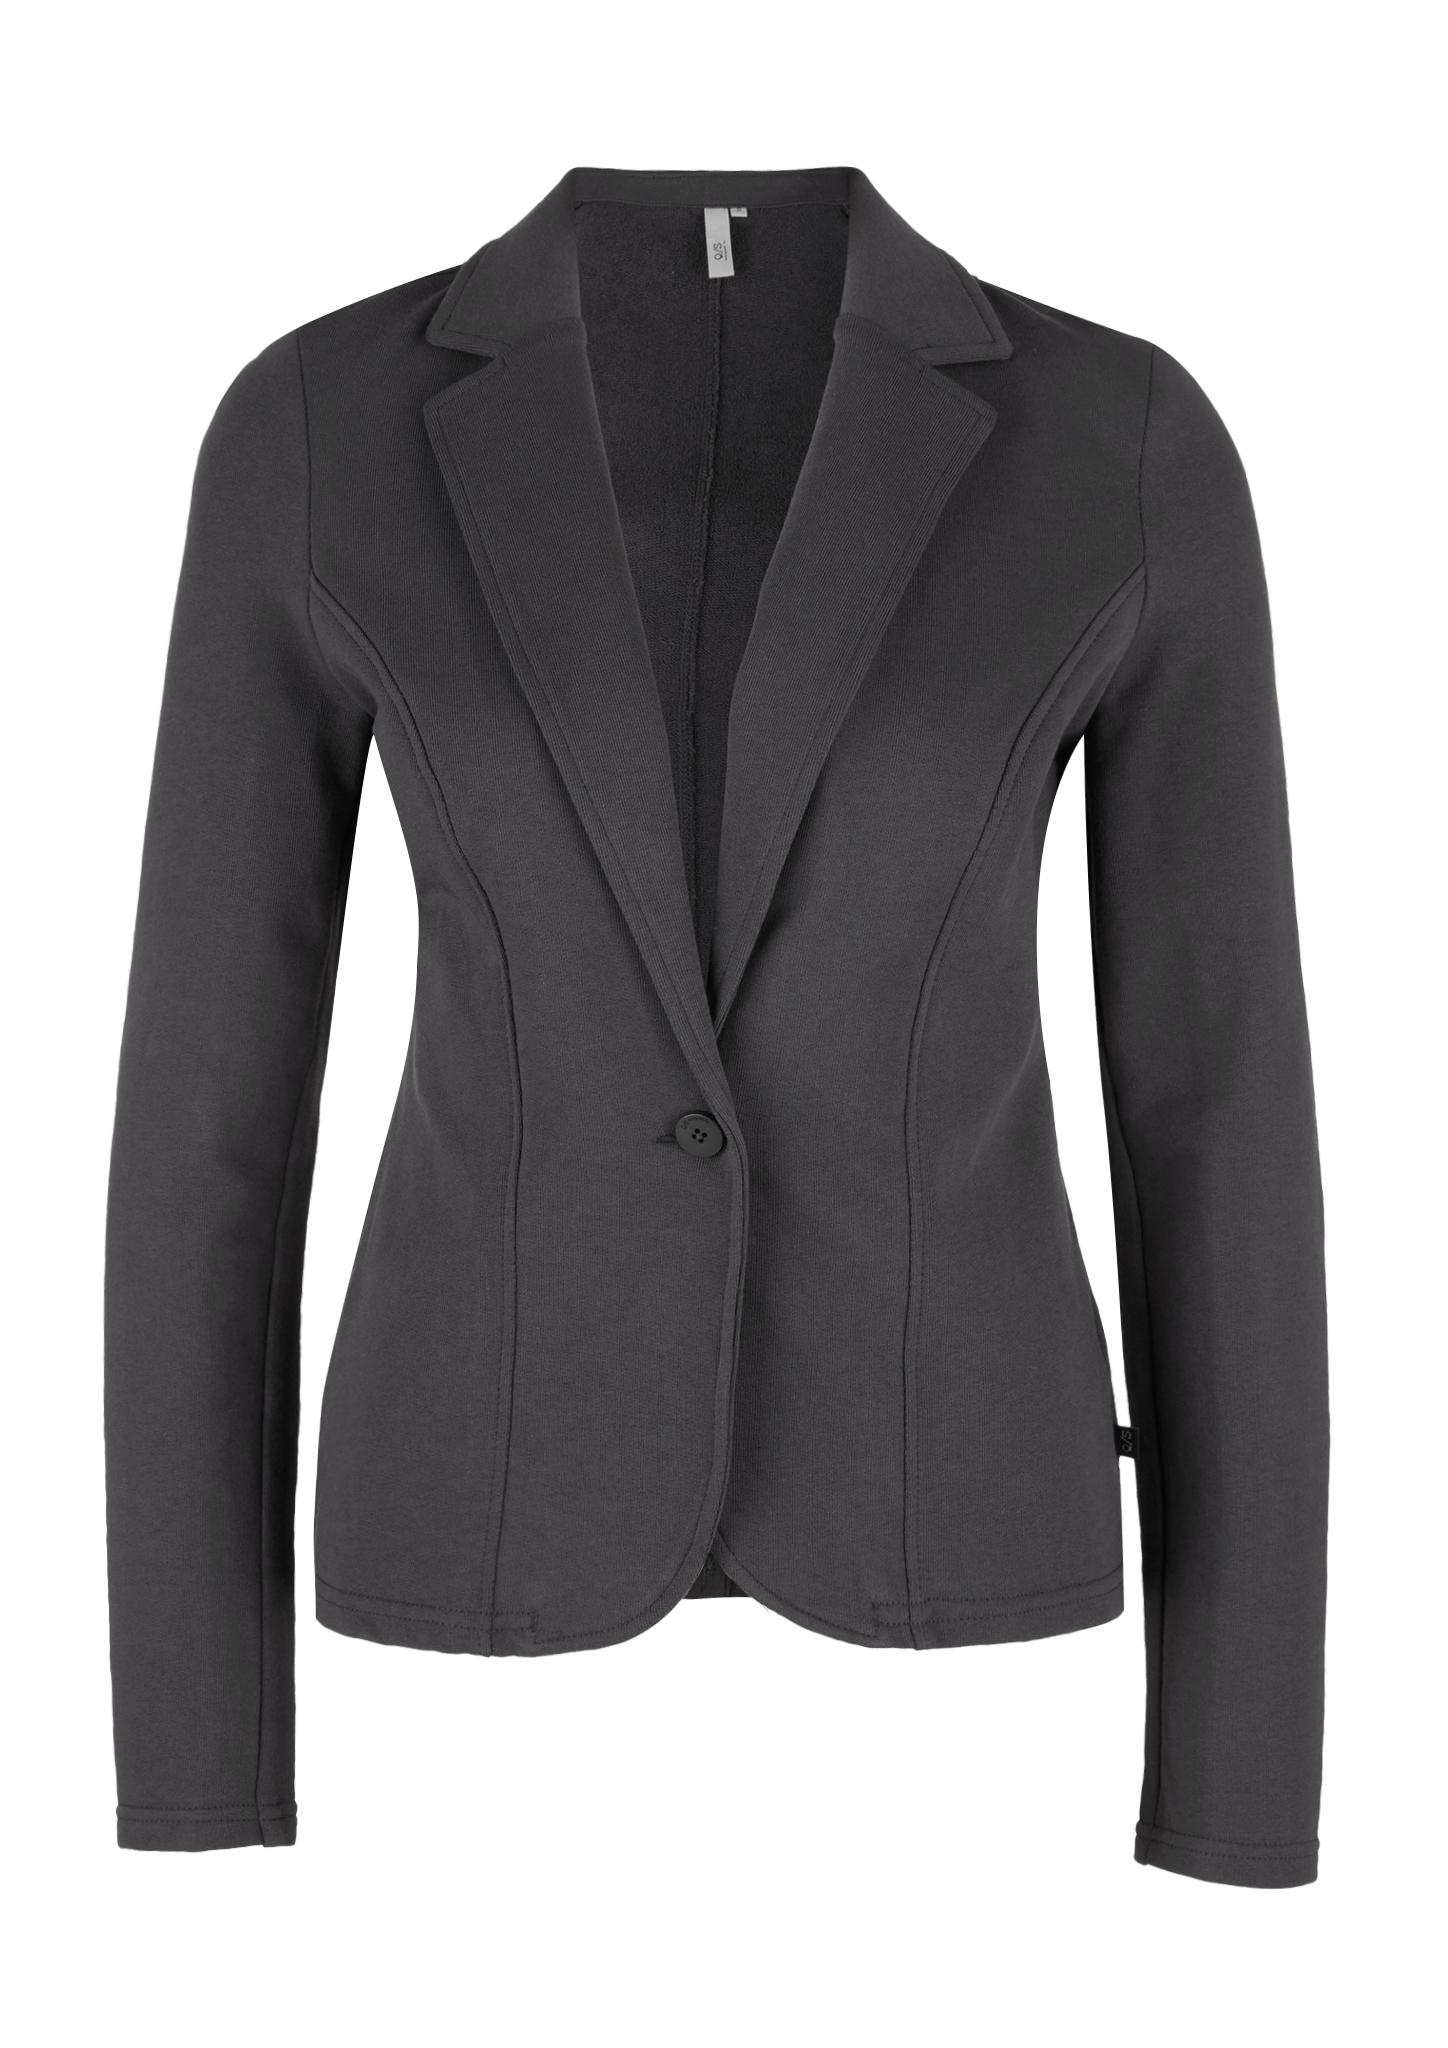 Sweatblazer | Bekleidung > Blazer > Sweatblazer | Grau/schwarz | 100% baumwolle | Q/S designed by